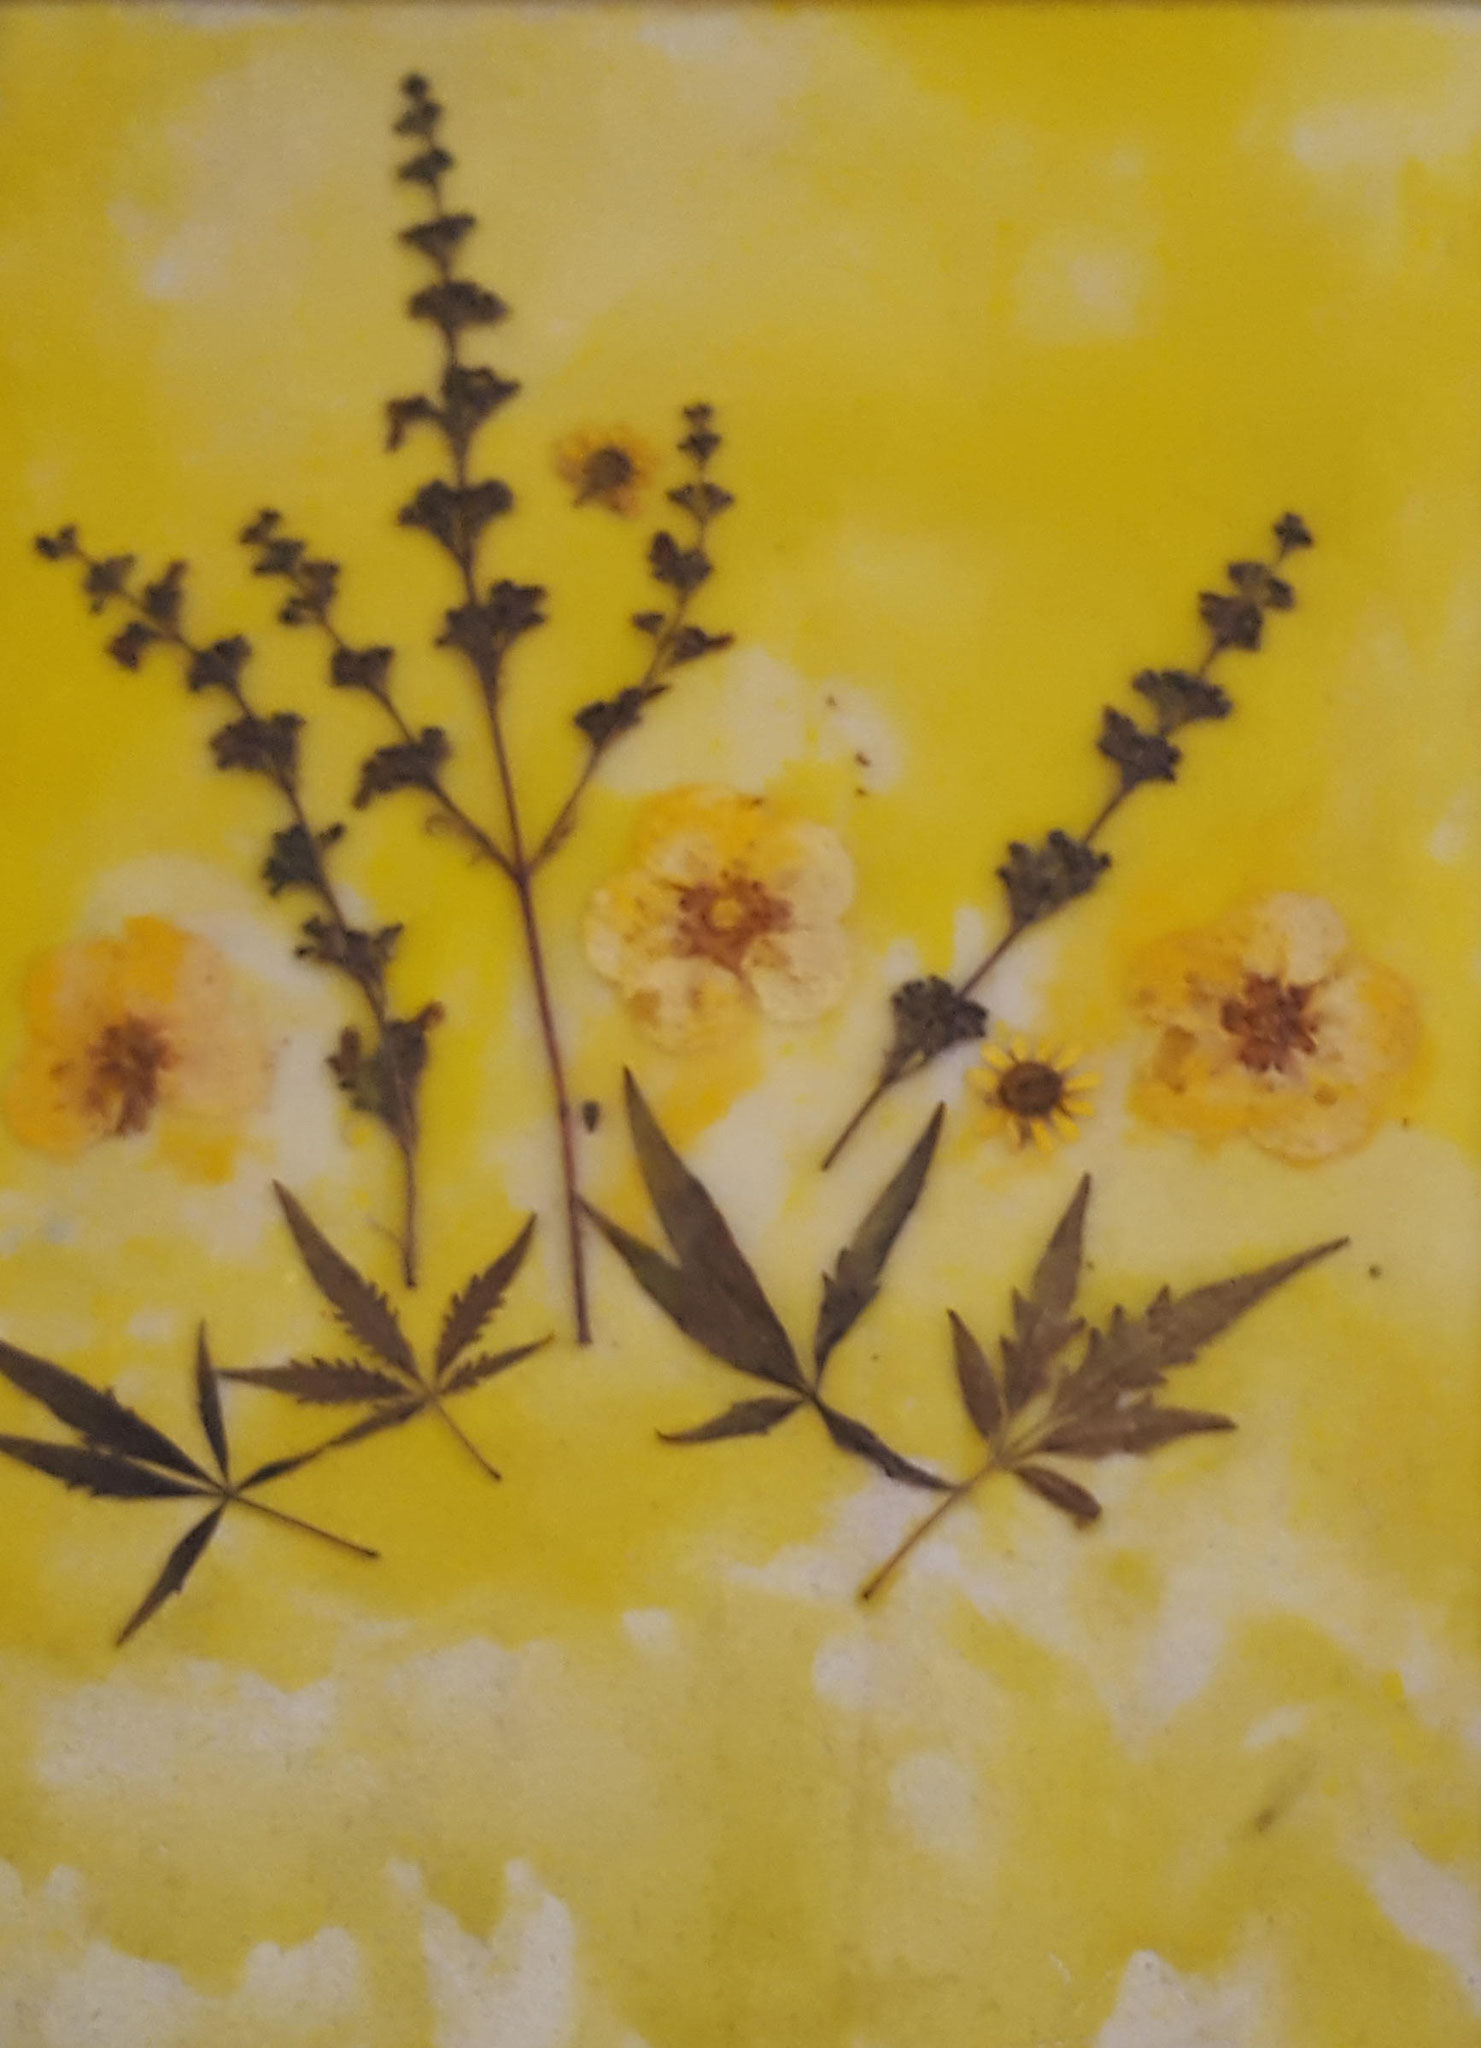 Nr. 109 - Blumenbild mit echten Blüten DIN A4 - 200 €